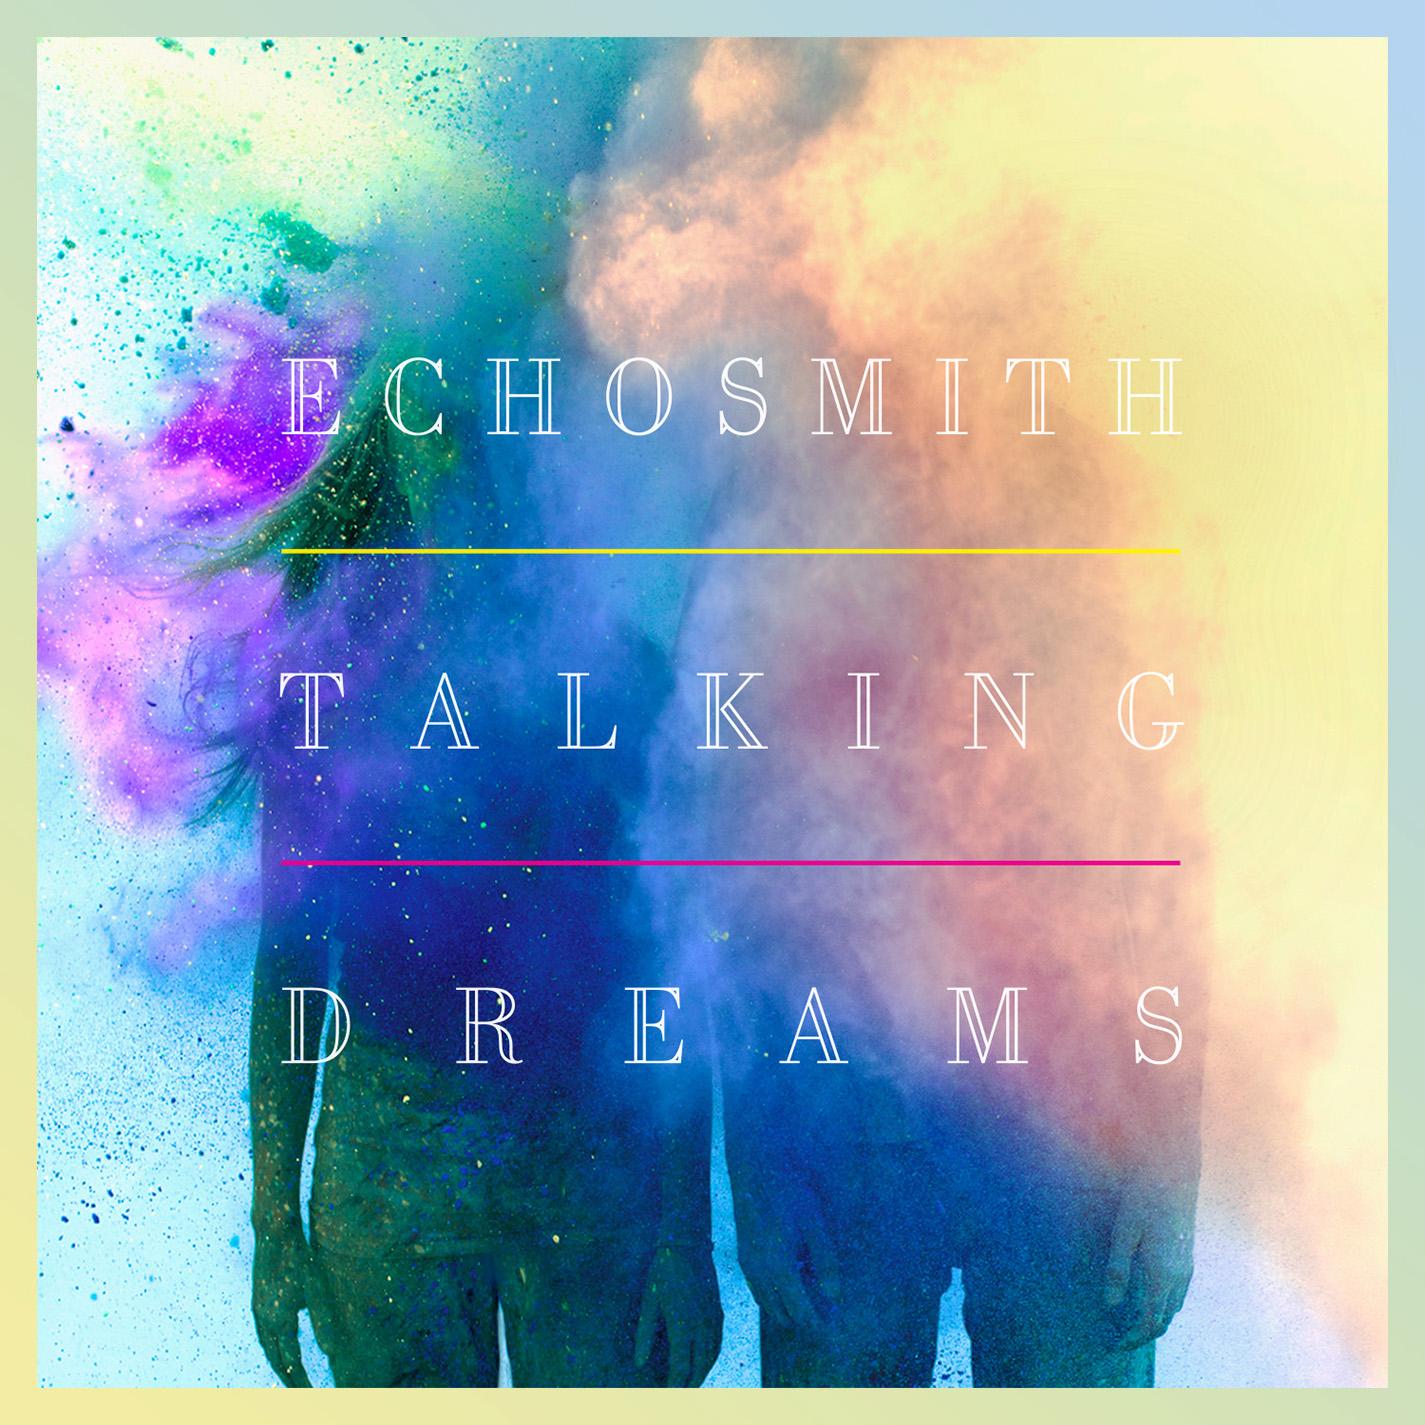 echosmith_talking_dreams_cover_art1.jpg